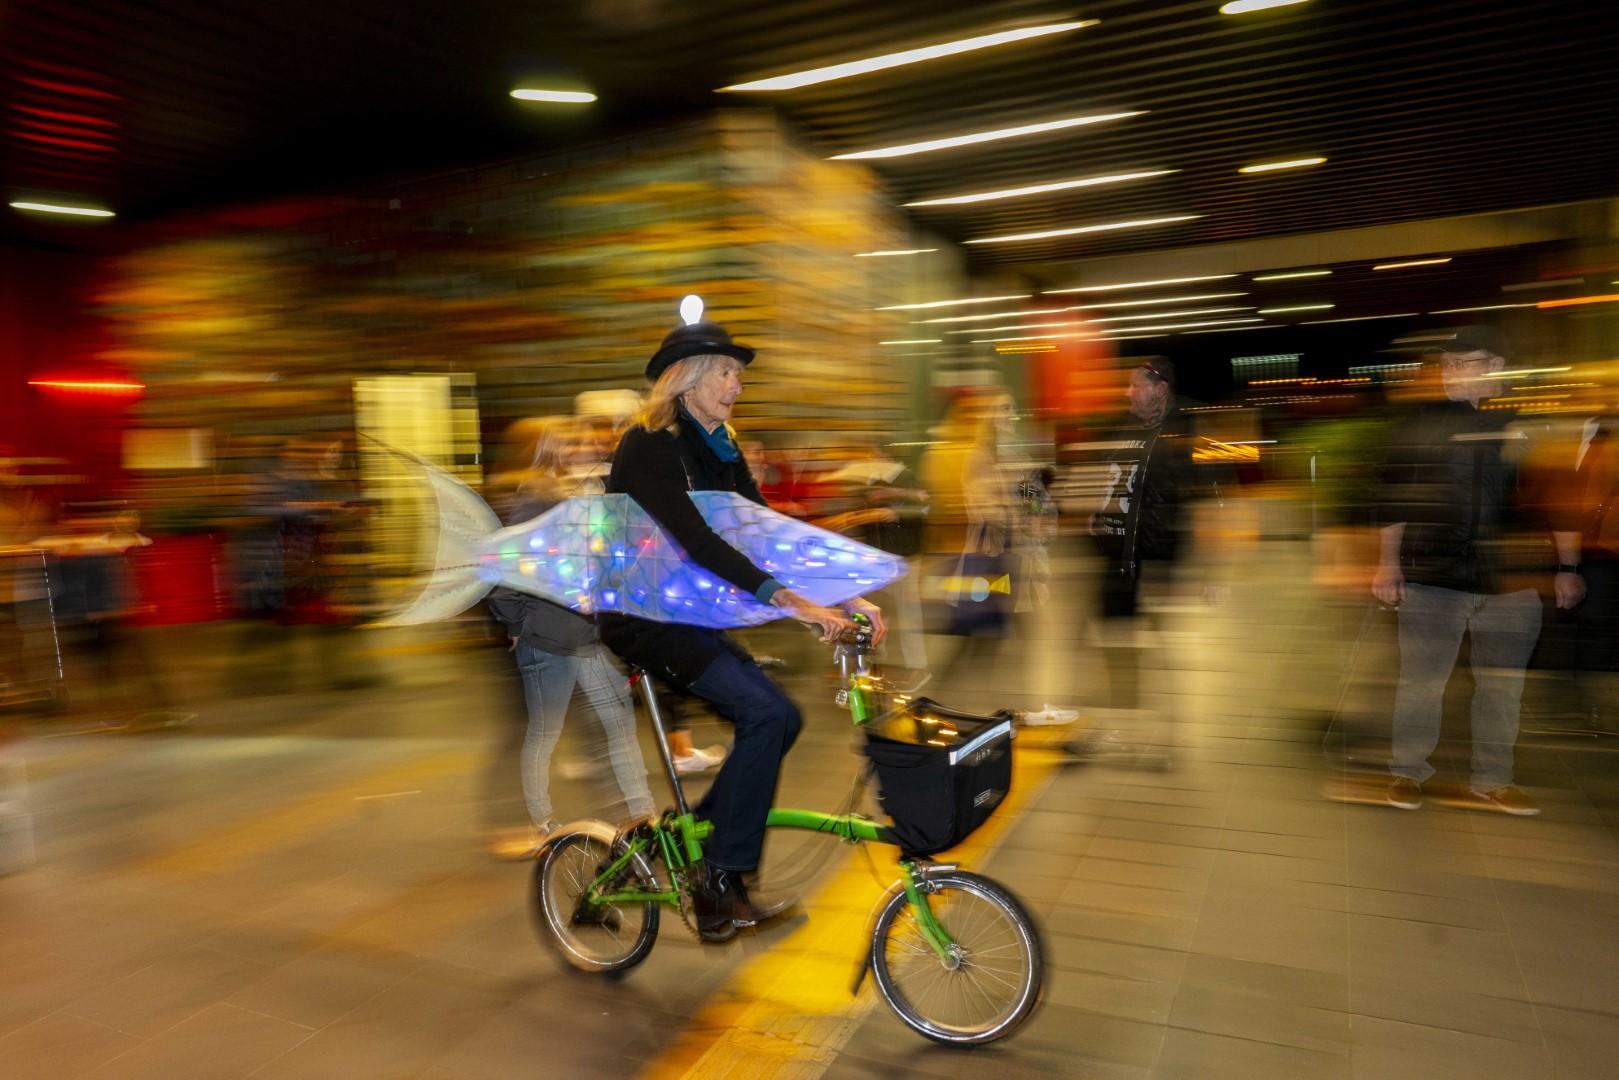 IMM fish bike blur 2.4MB photography John McDermott DSC03275 (Large).jpg